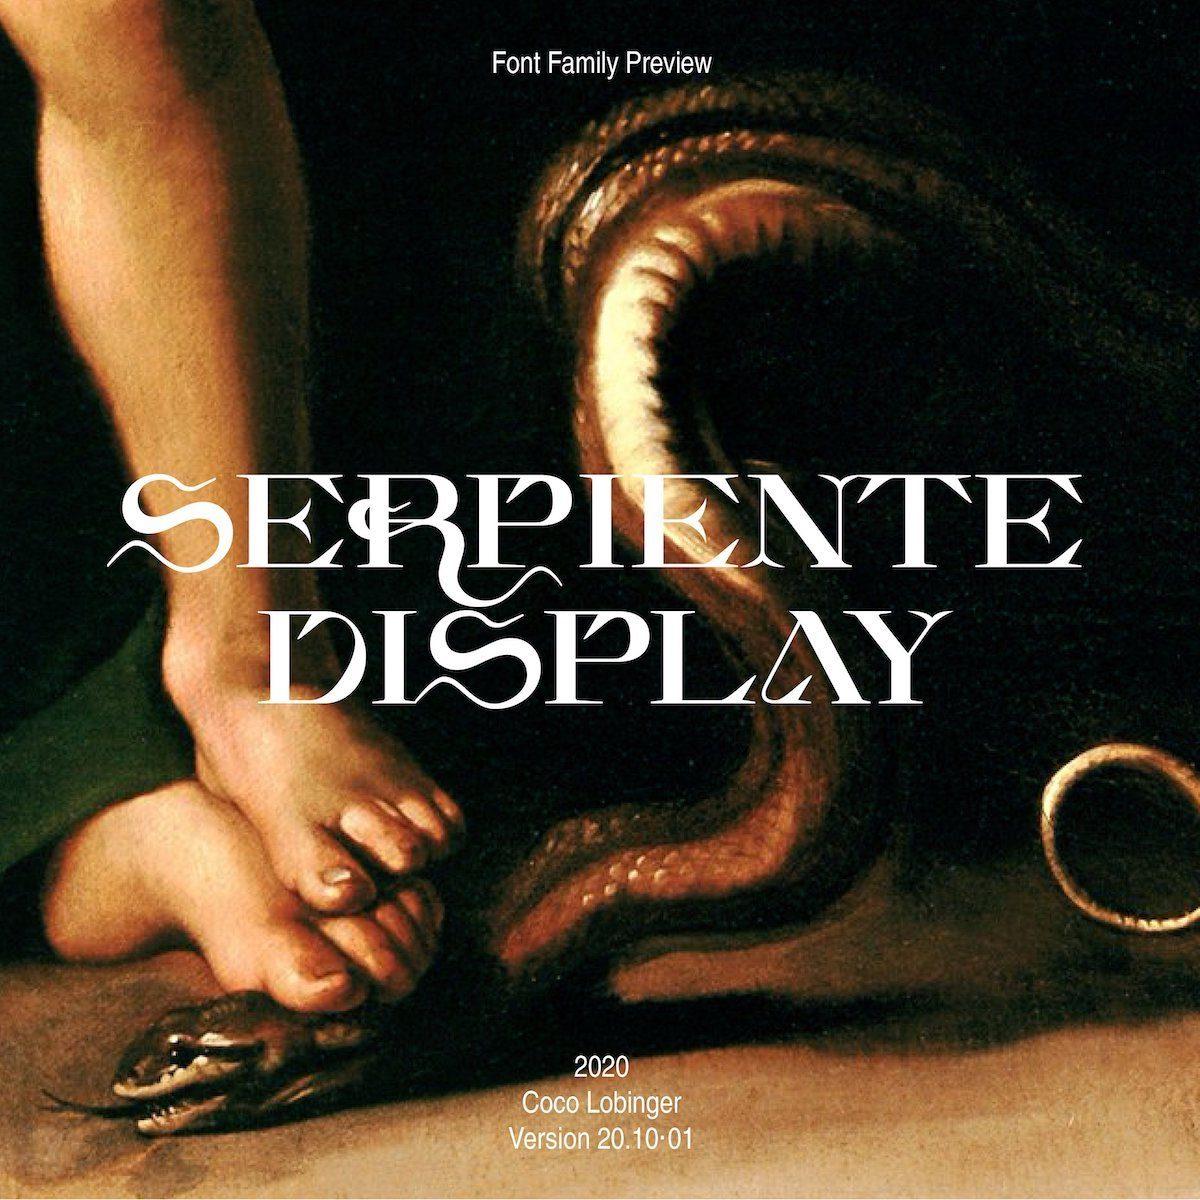 Serpiente Display Typeface Specimen